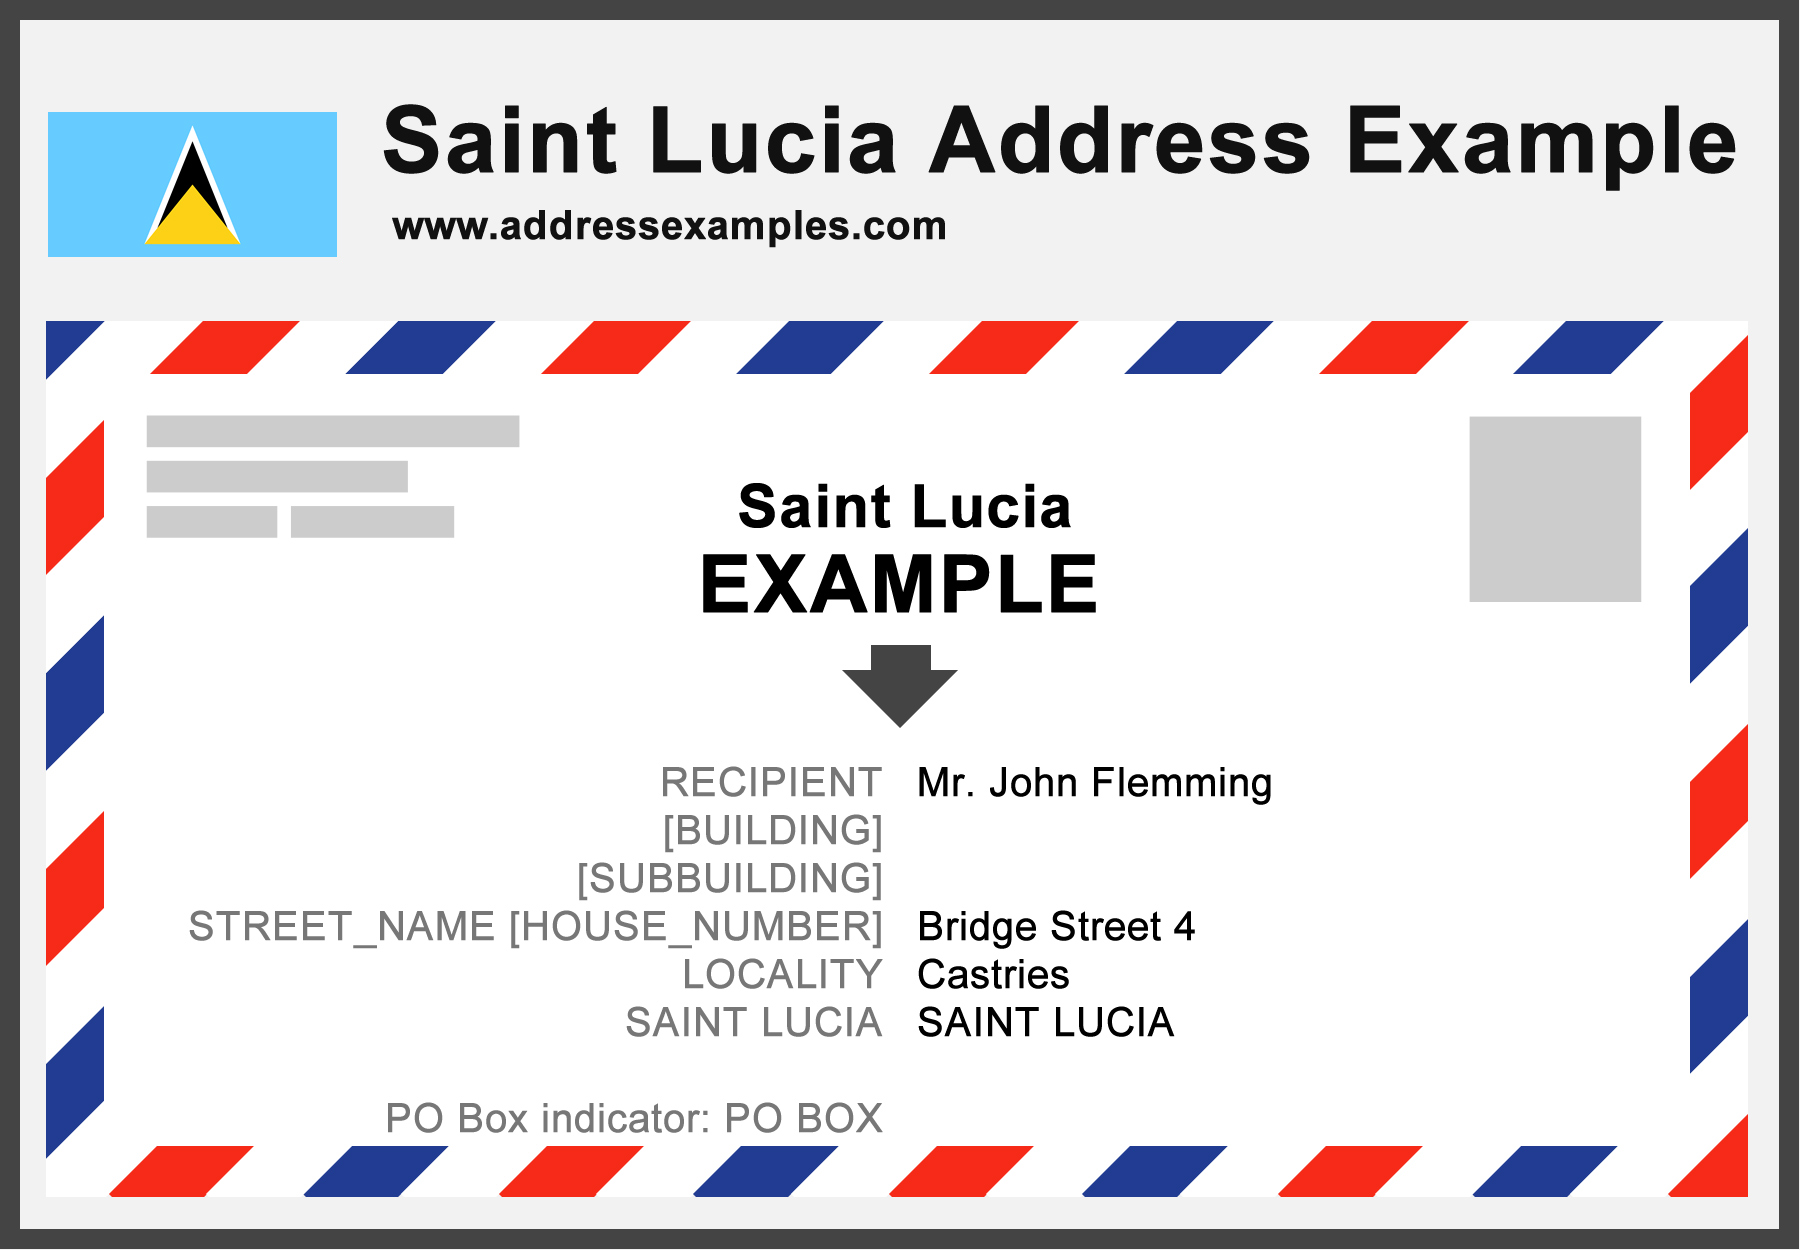 Saint Lucia Address Example